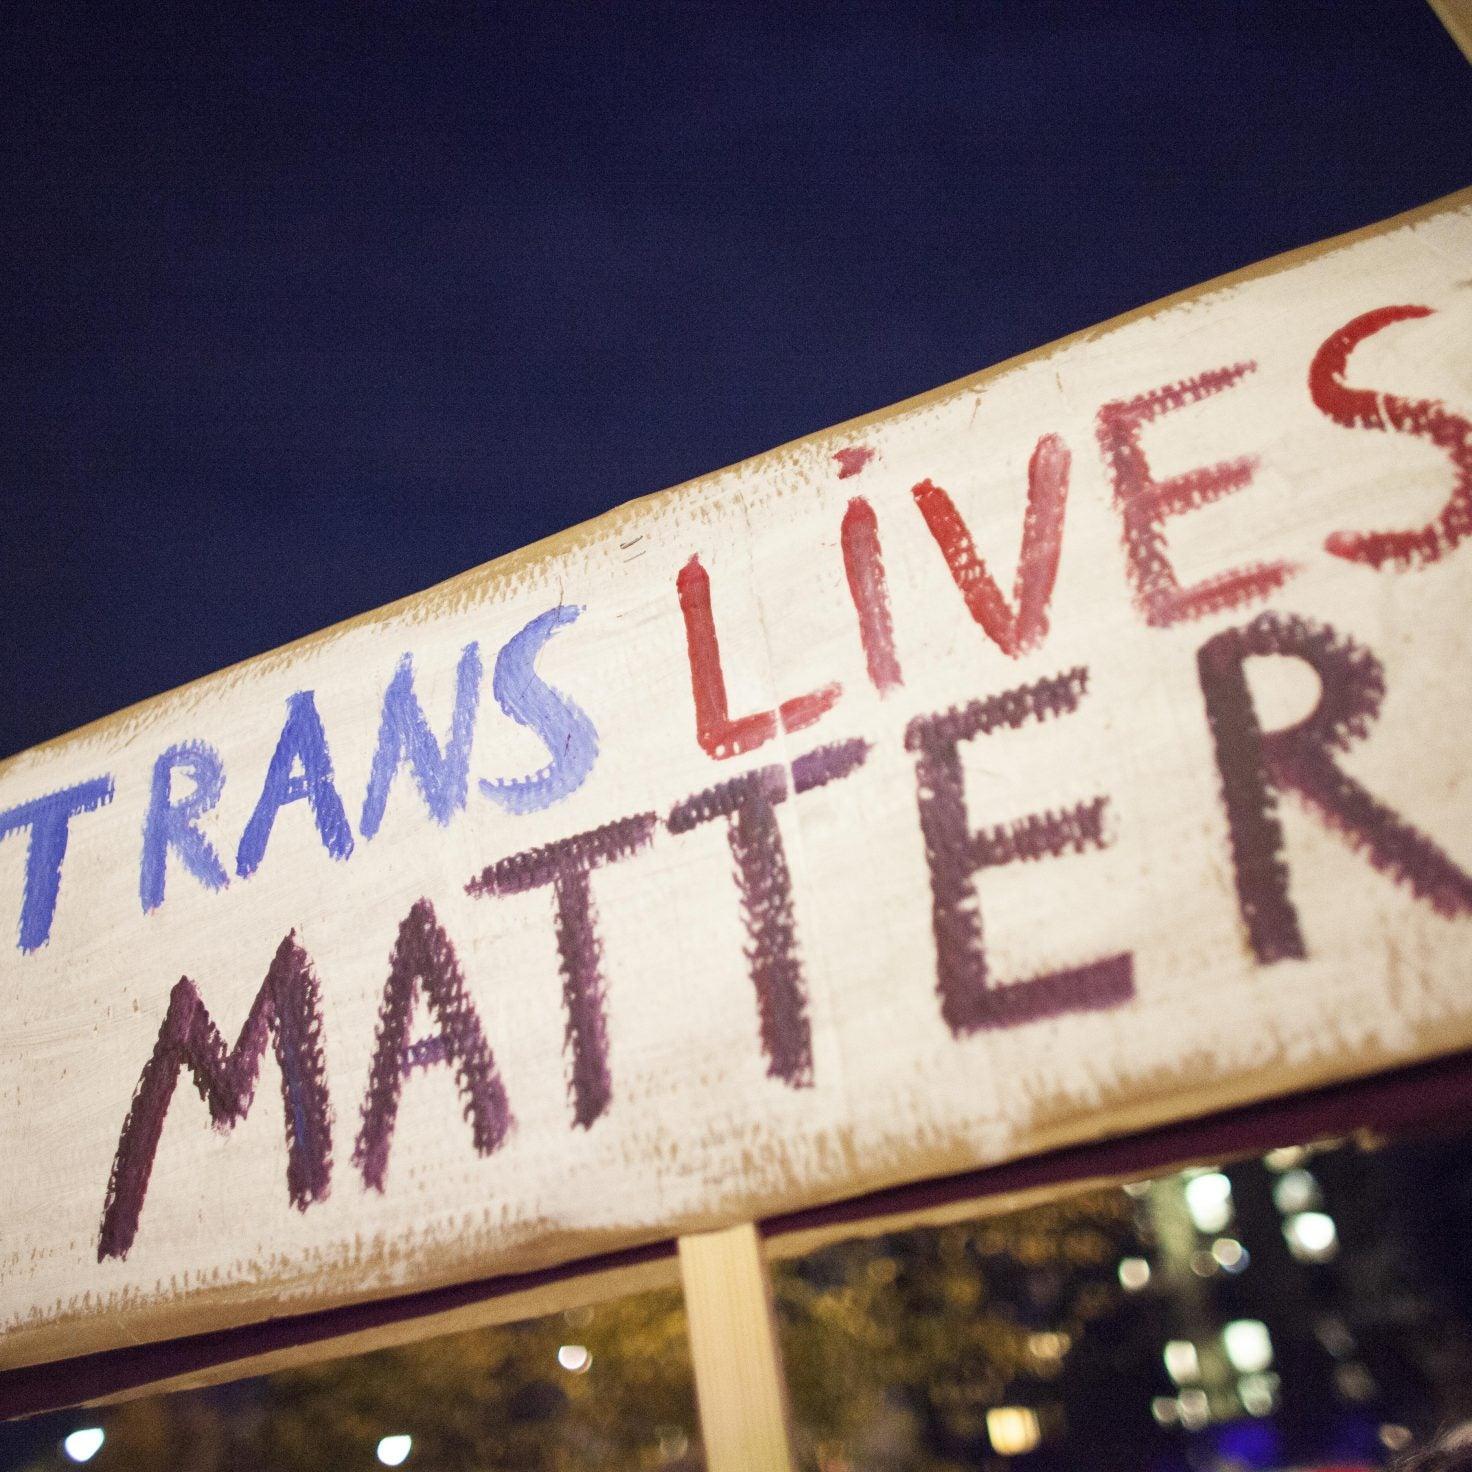 Transgender Advocate Michelle 'Tamika' Washington Shot And Killed In Philadelphia, Suspect Arrested